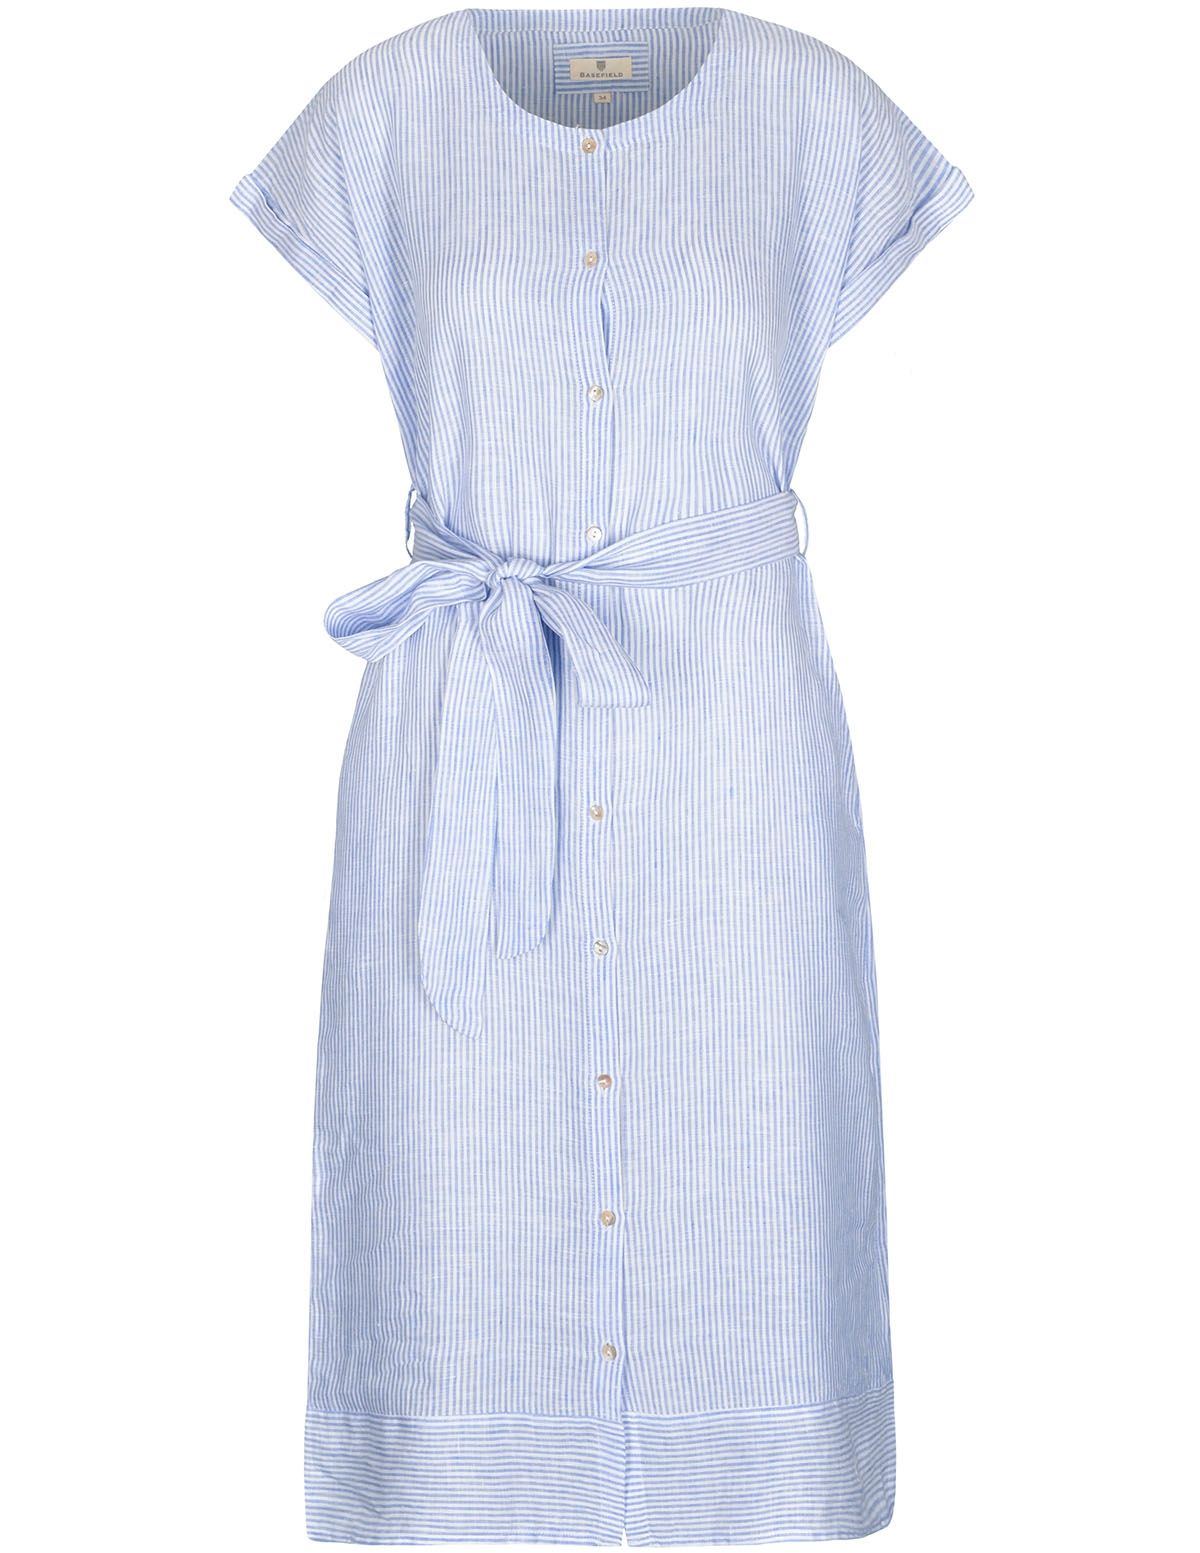 Leinenkleid - Summerblue Stripe